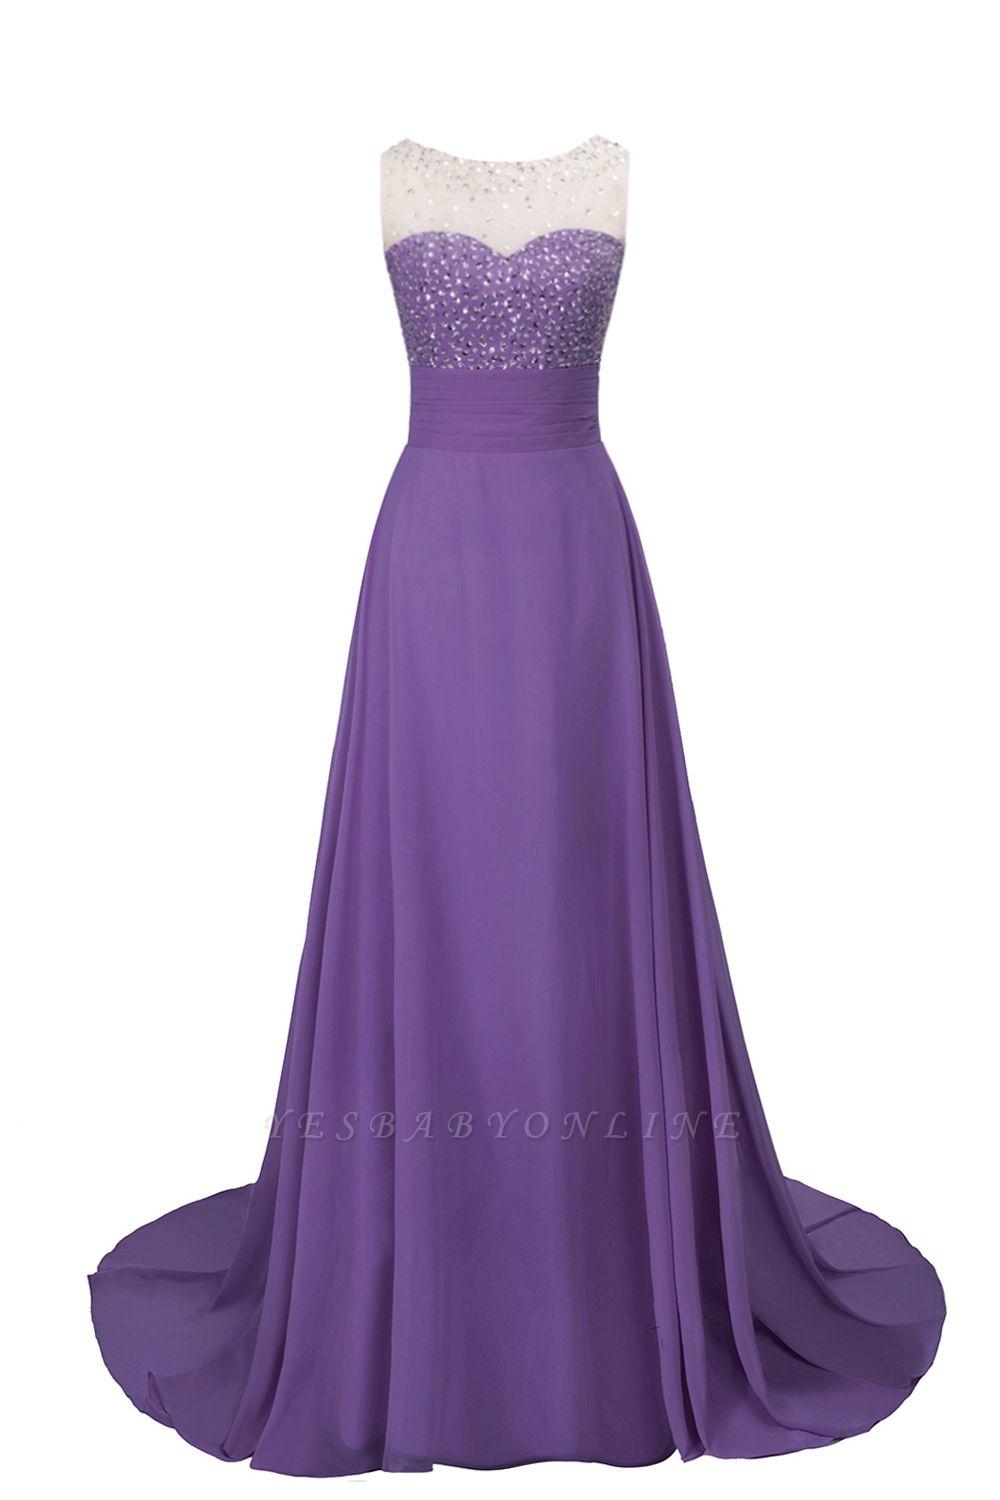 Cheap Grape A-line Sleeveless Sweep Train Prom Dress